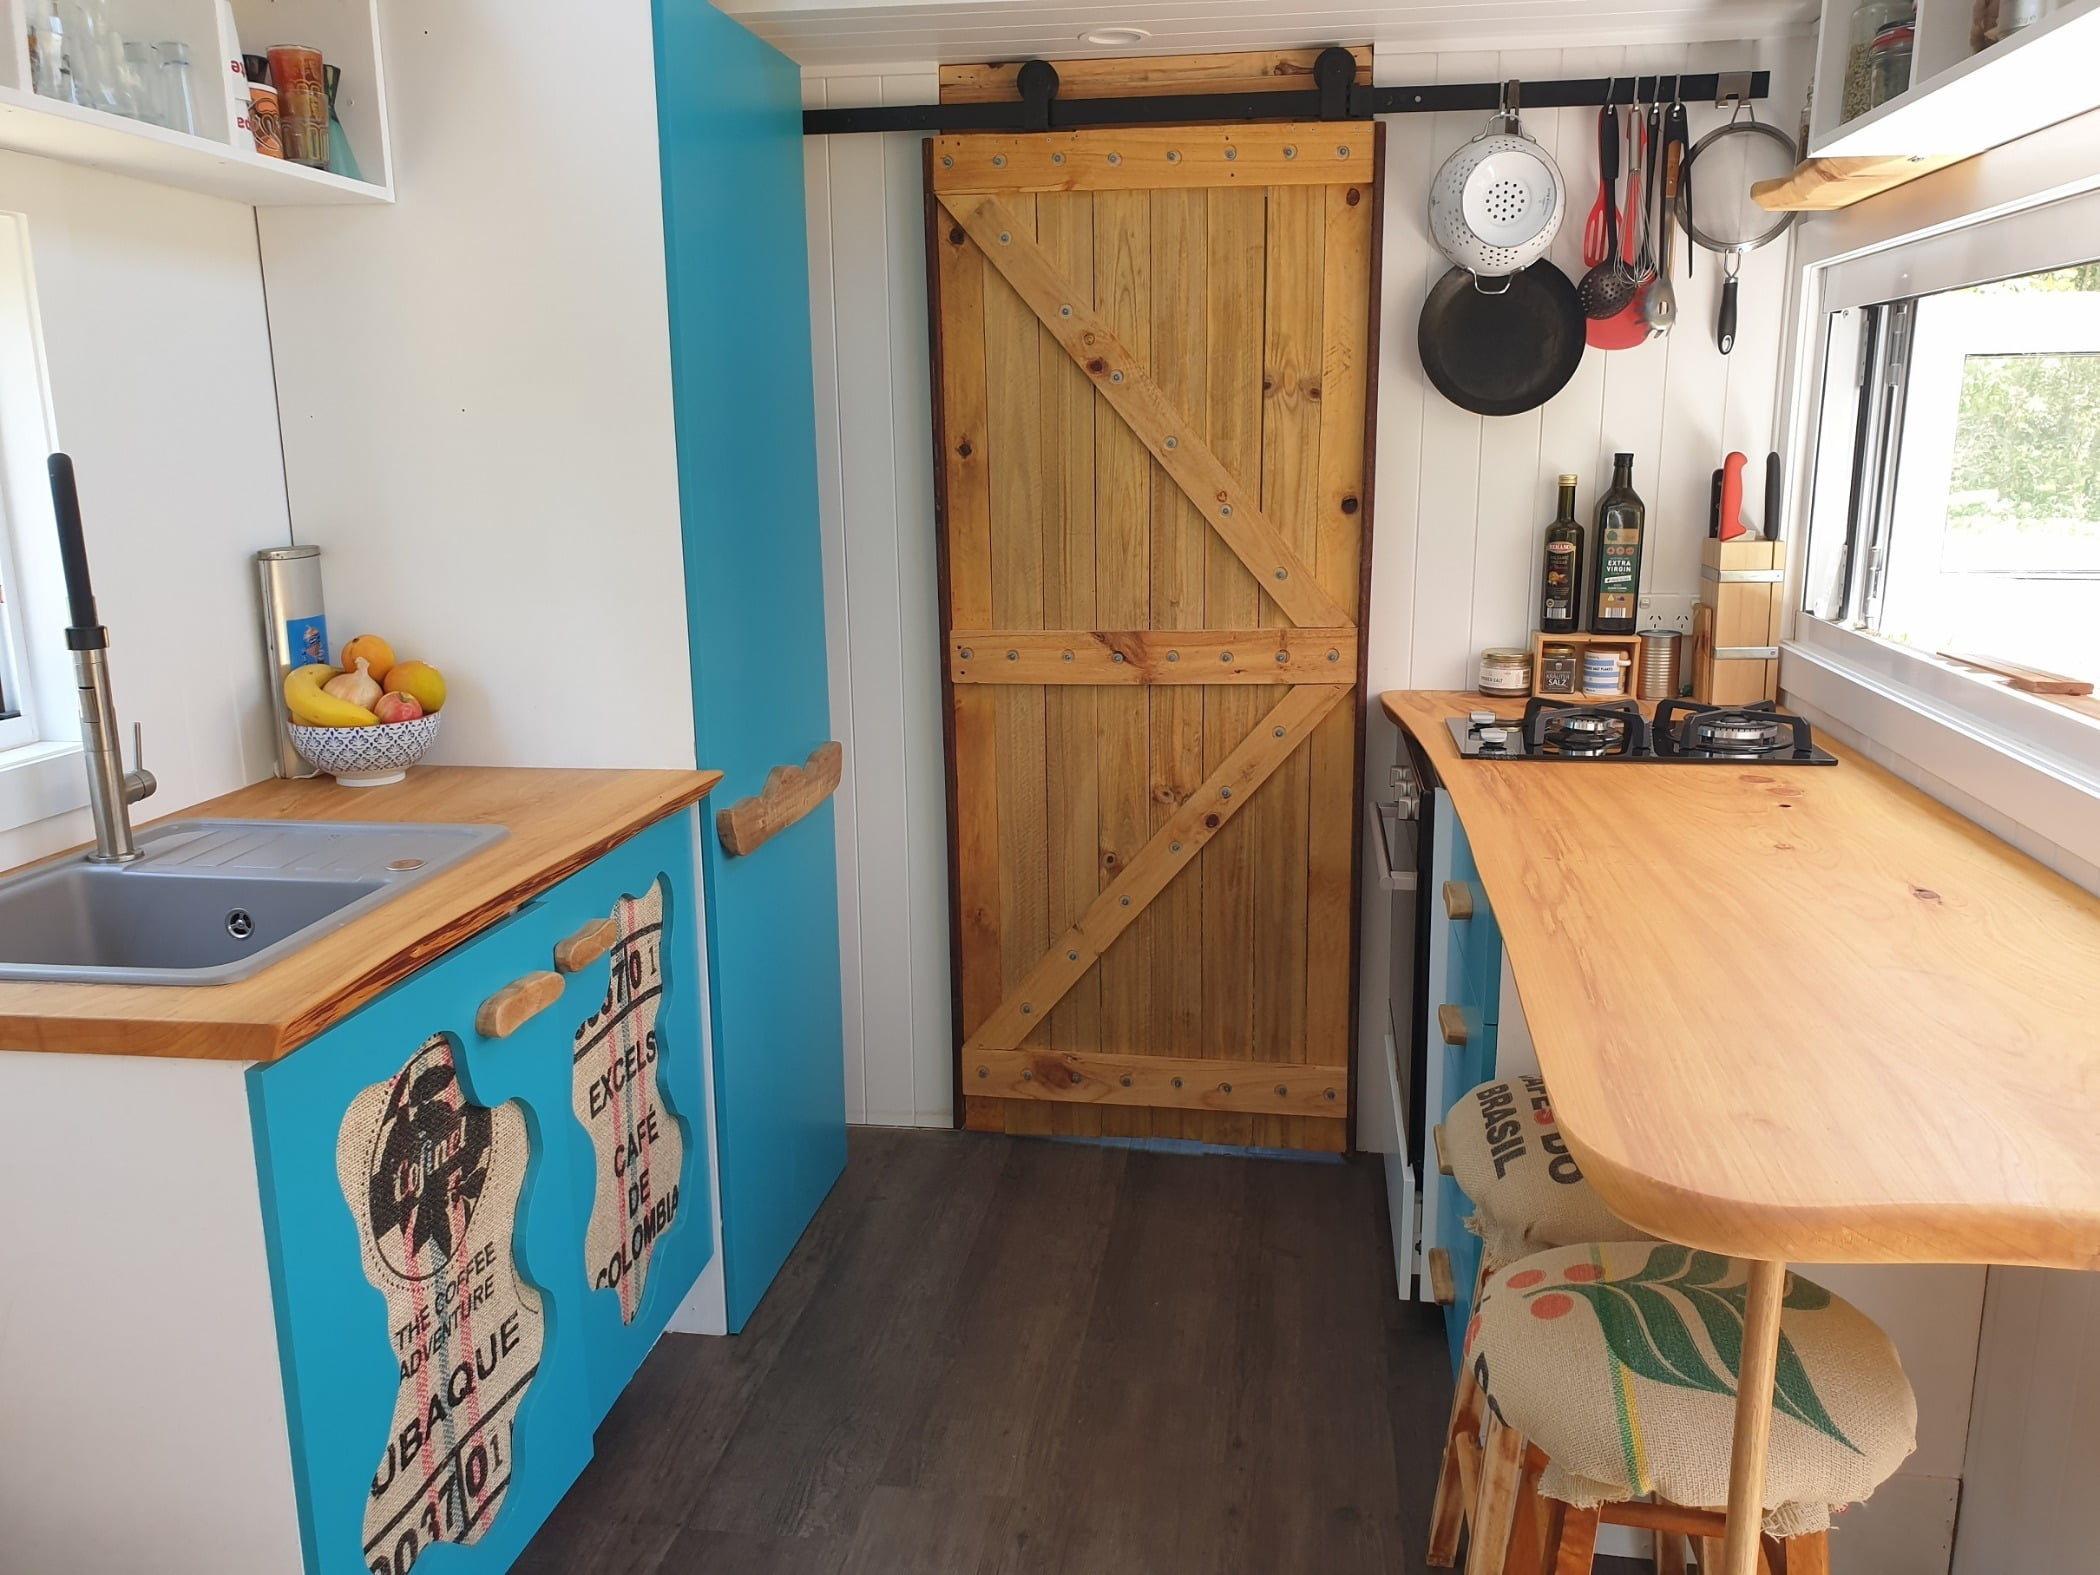 Kitchen sink, Interior design, Property, Cabinetry, Furniture, Wood, Window, Flooring